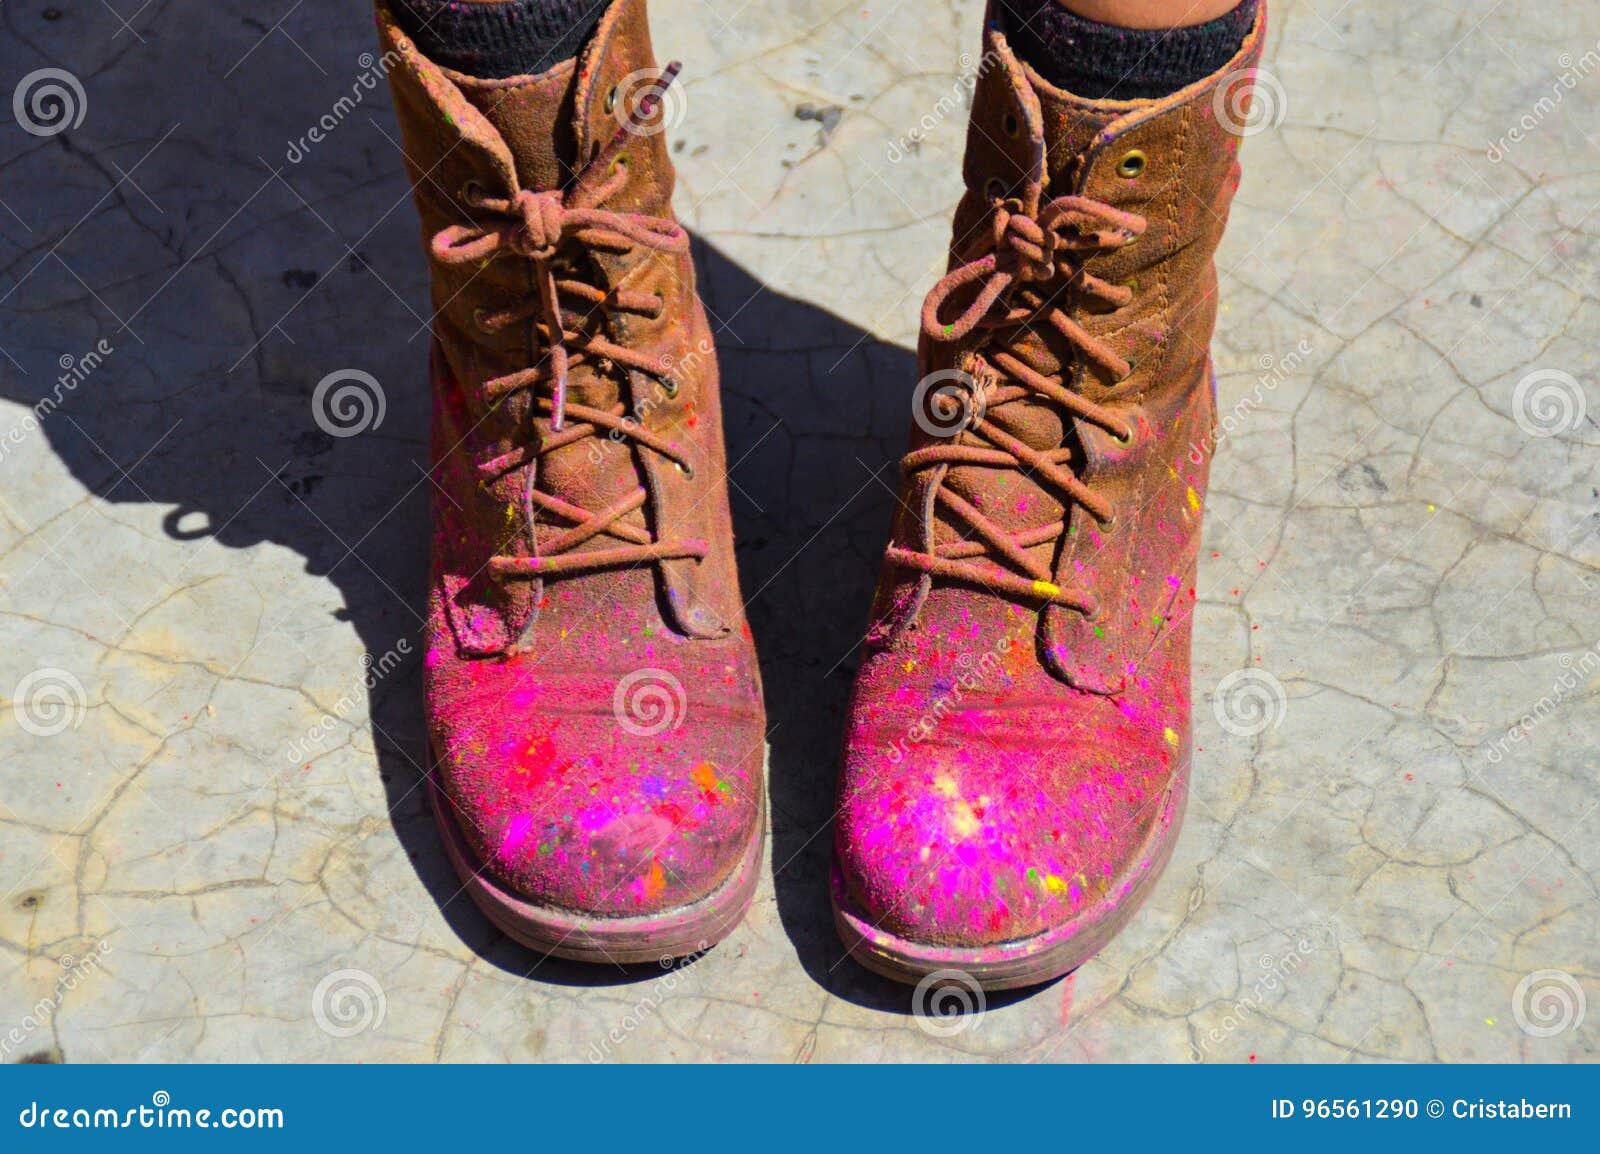 cfbb661f468 That& x27 s πώς τα παπούτσια μοιάζουν με μετά από το φεστιβάλ holi στο  pokhara του Νεπάλ